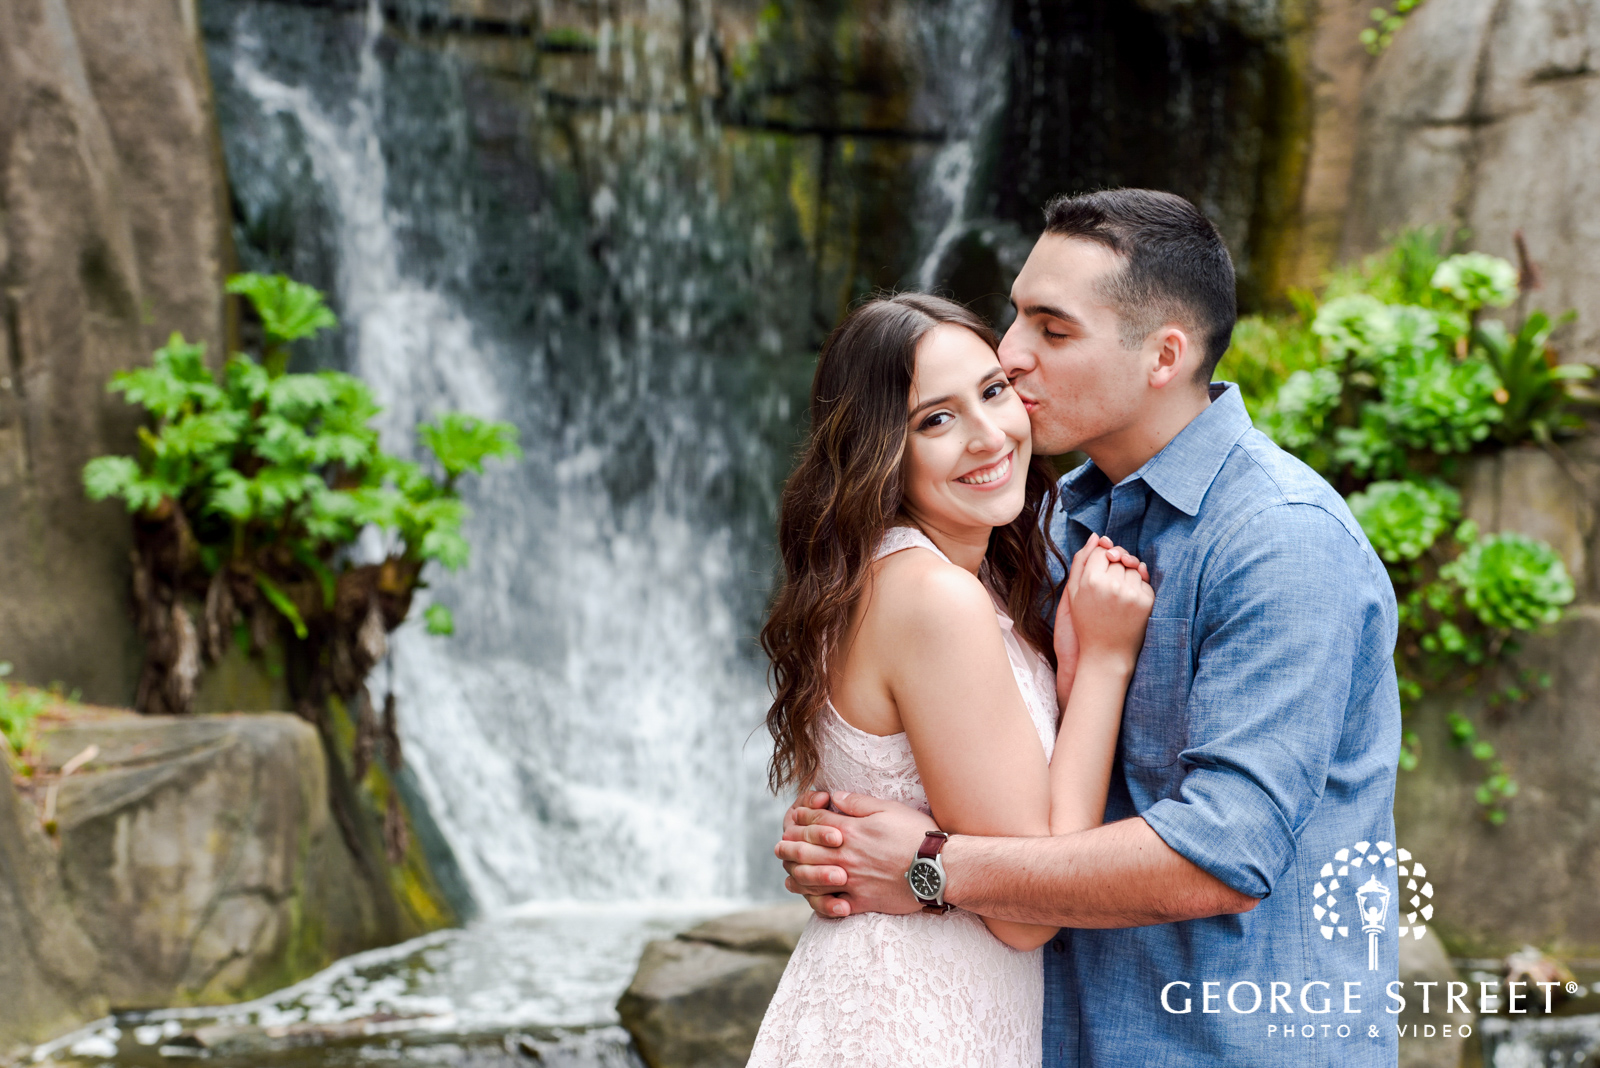 gorgeous outdoor engagement portrait at golden gate state park 3